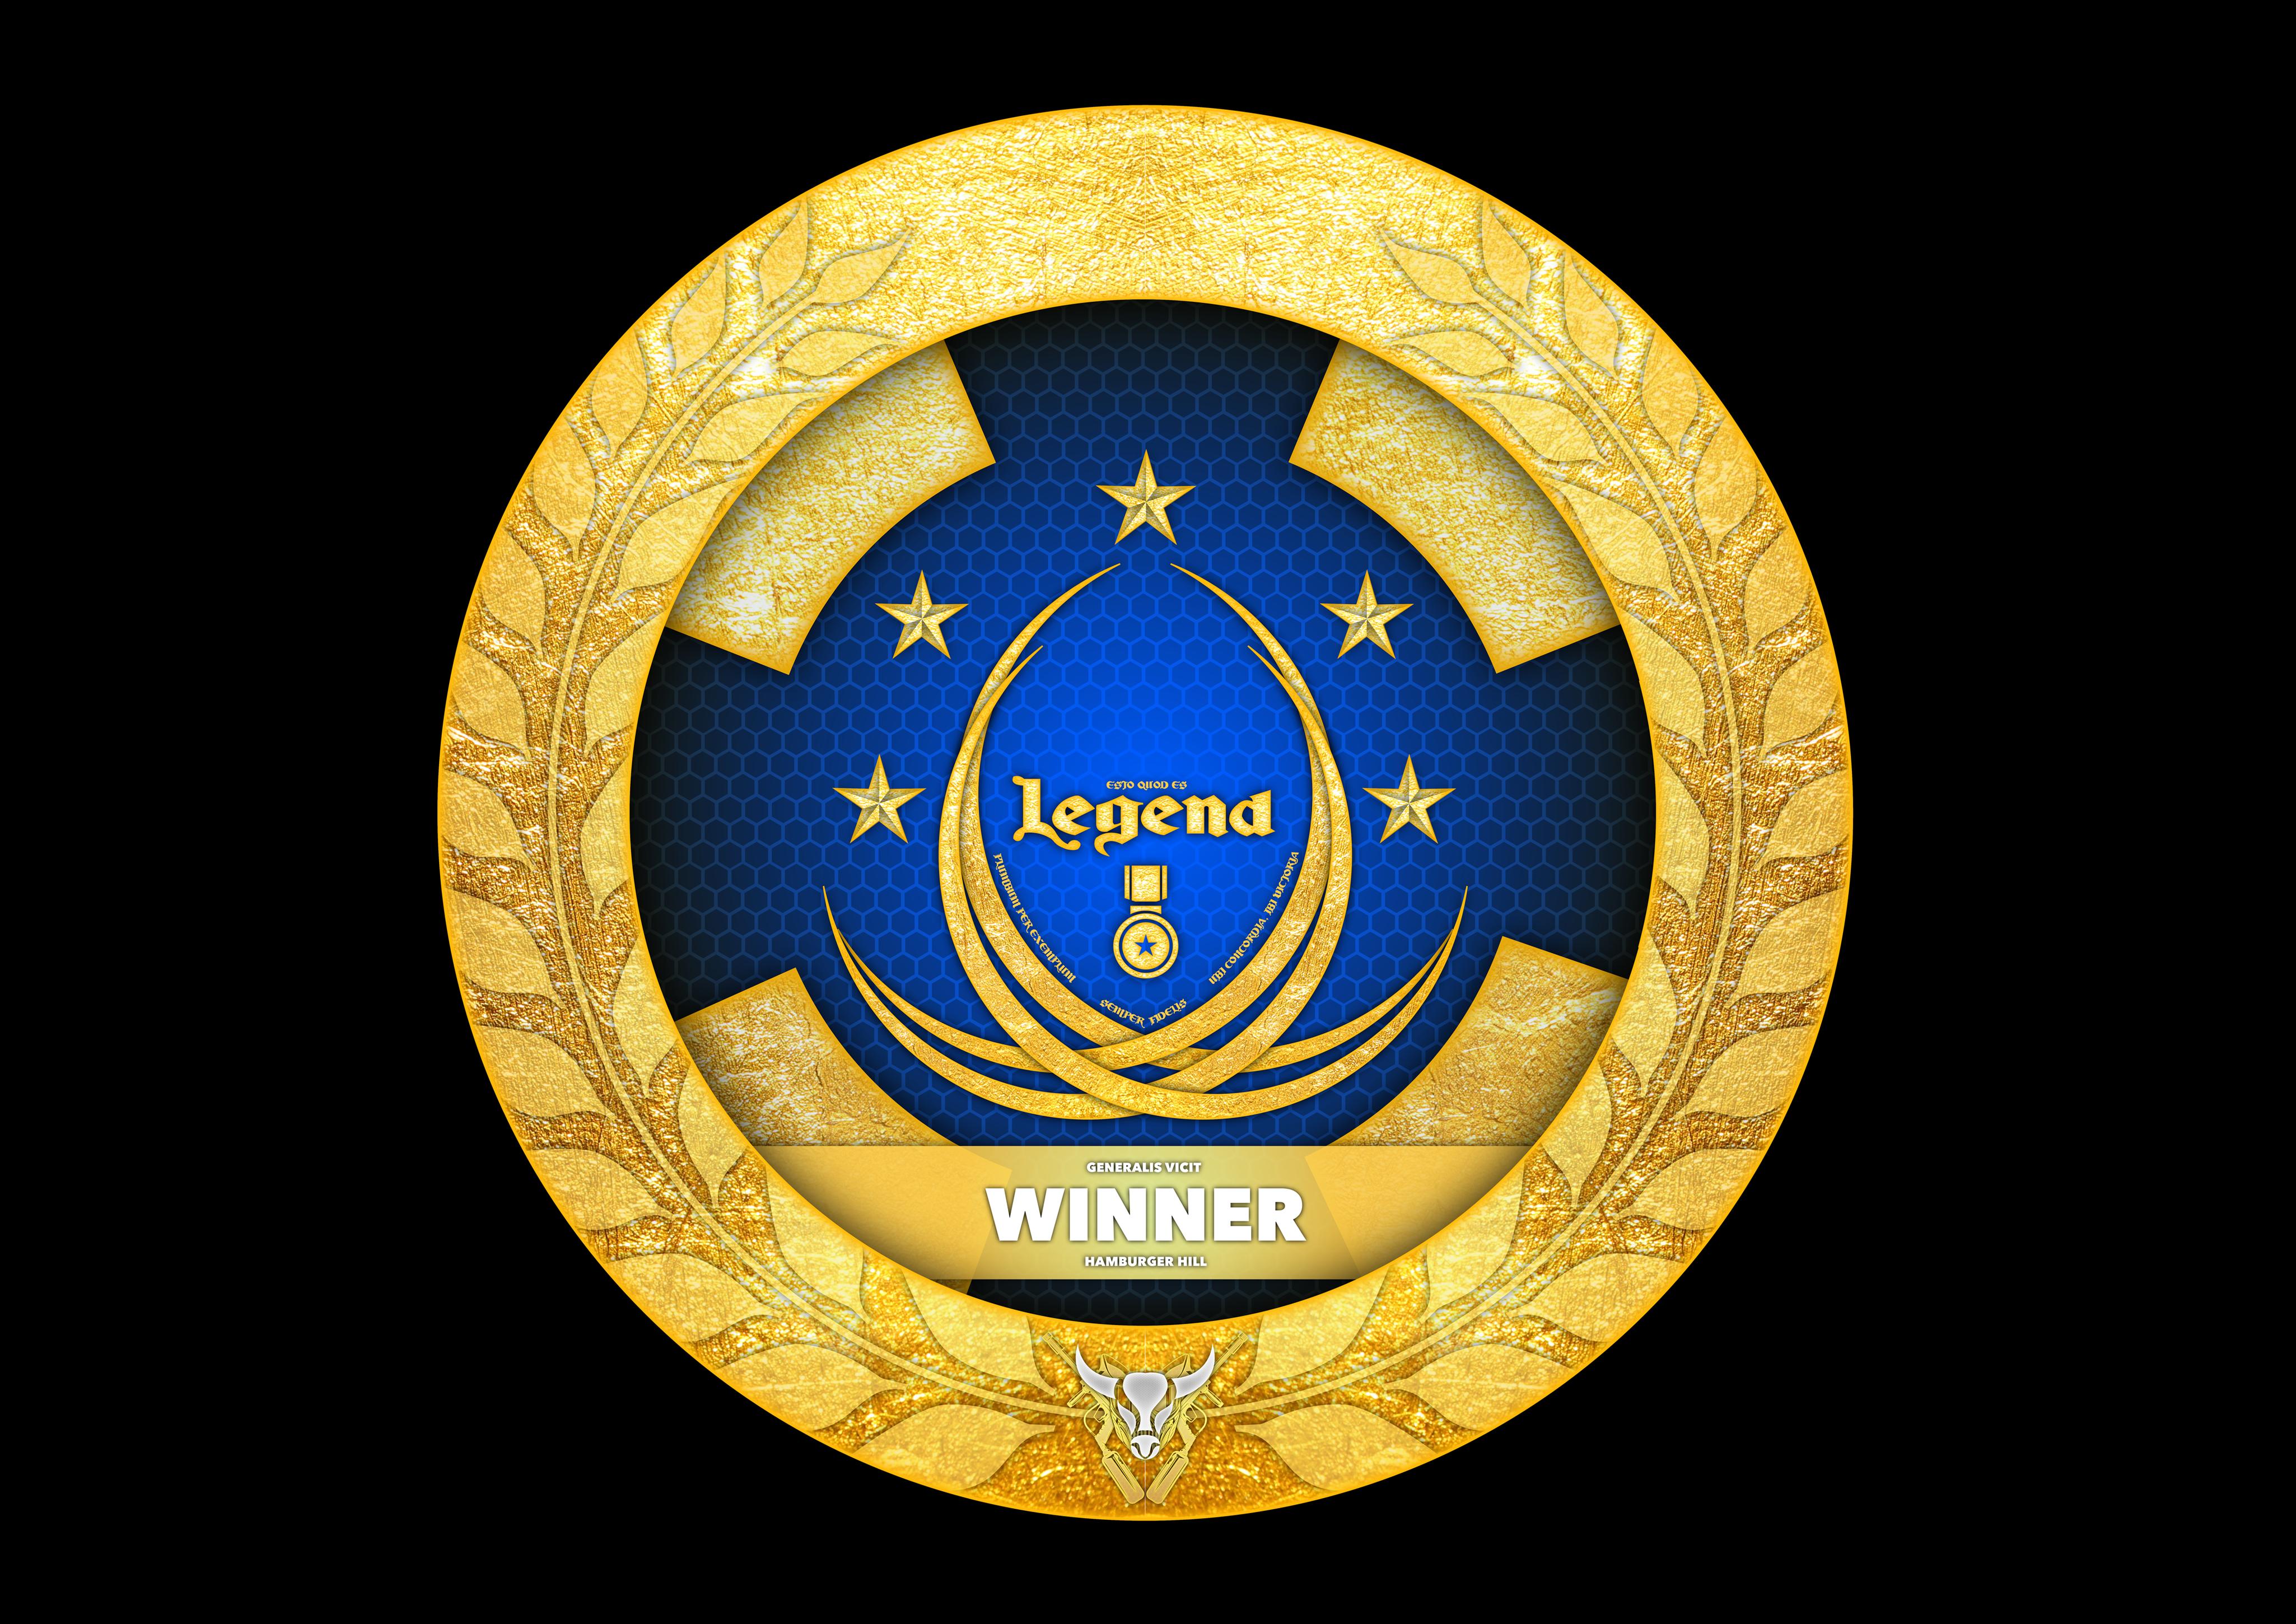 Winning General